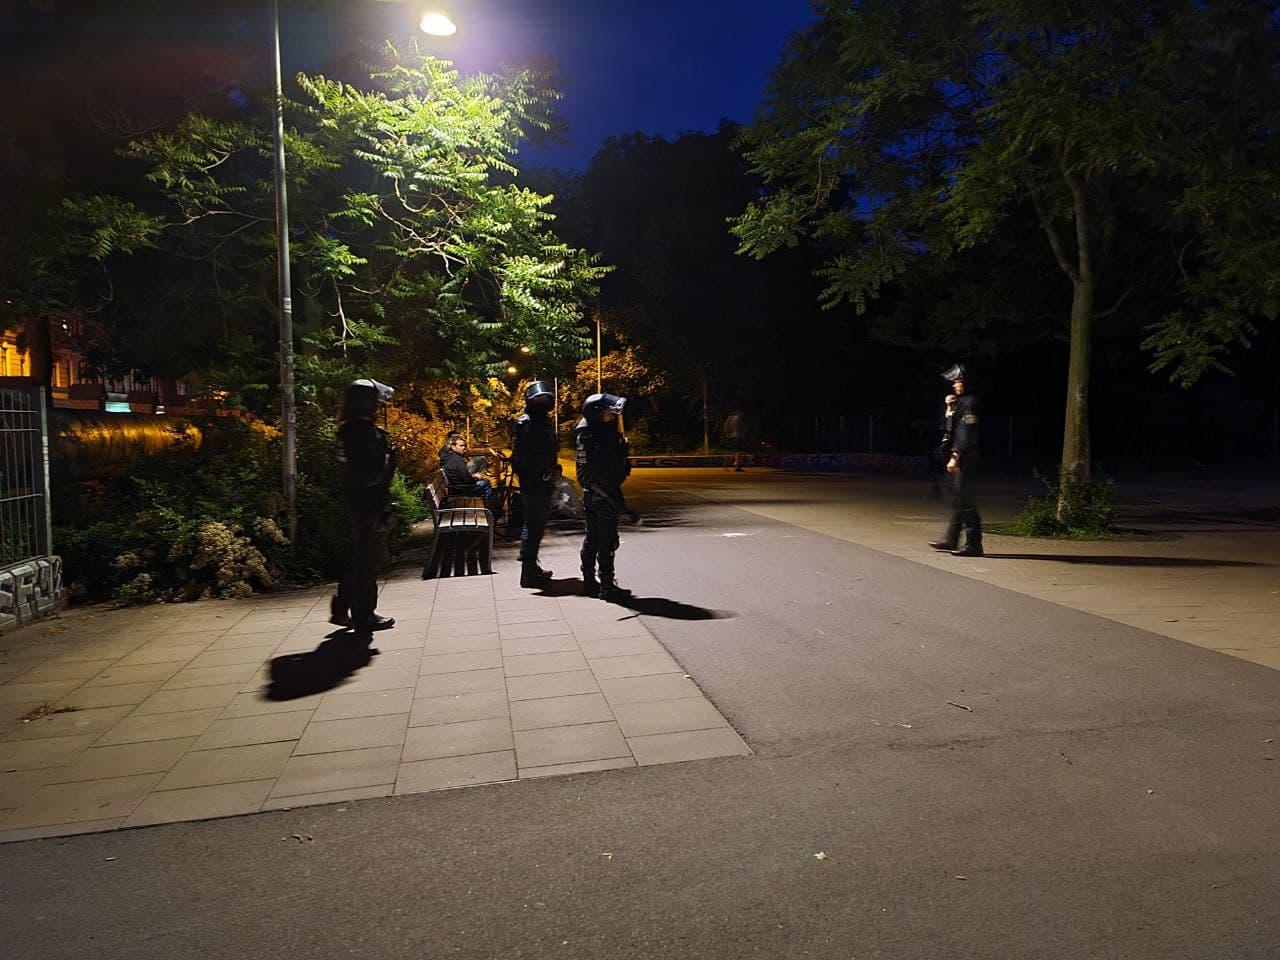 Räumung im Park. Foto: LZ